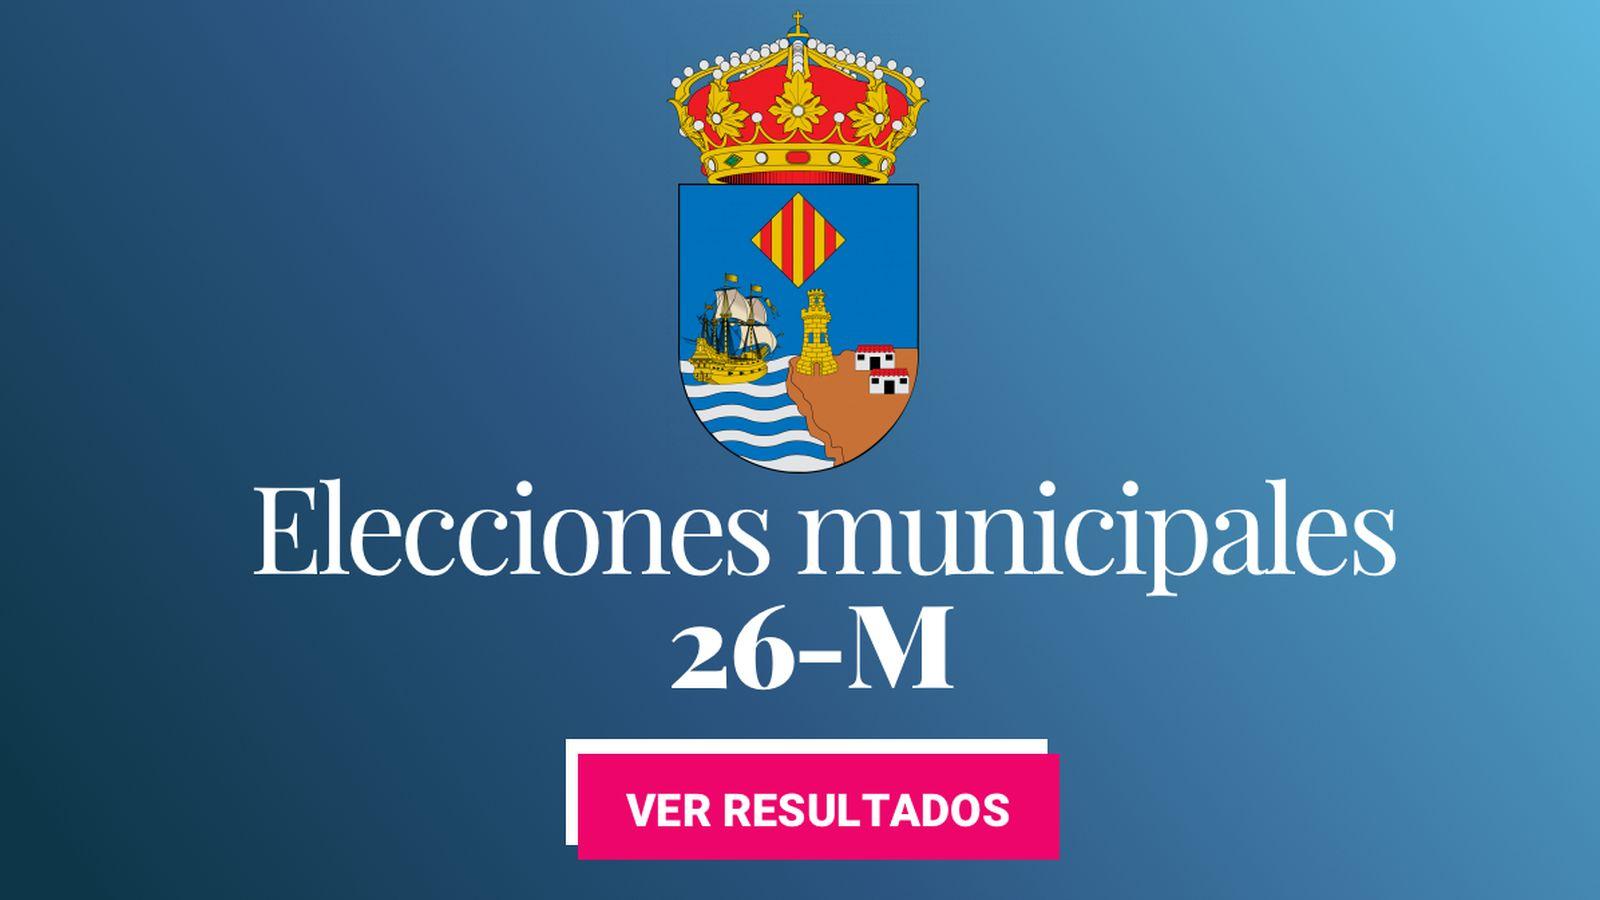 Foto: Elecciones municipales 2019 en Torrevieja. (C.C./EC)